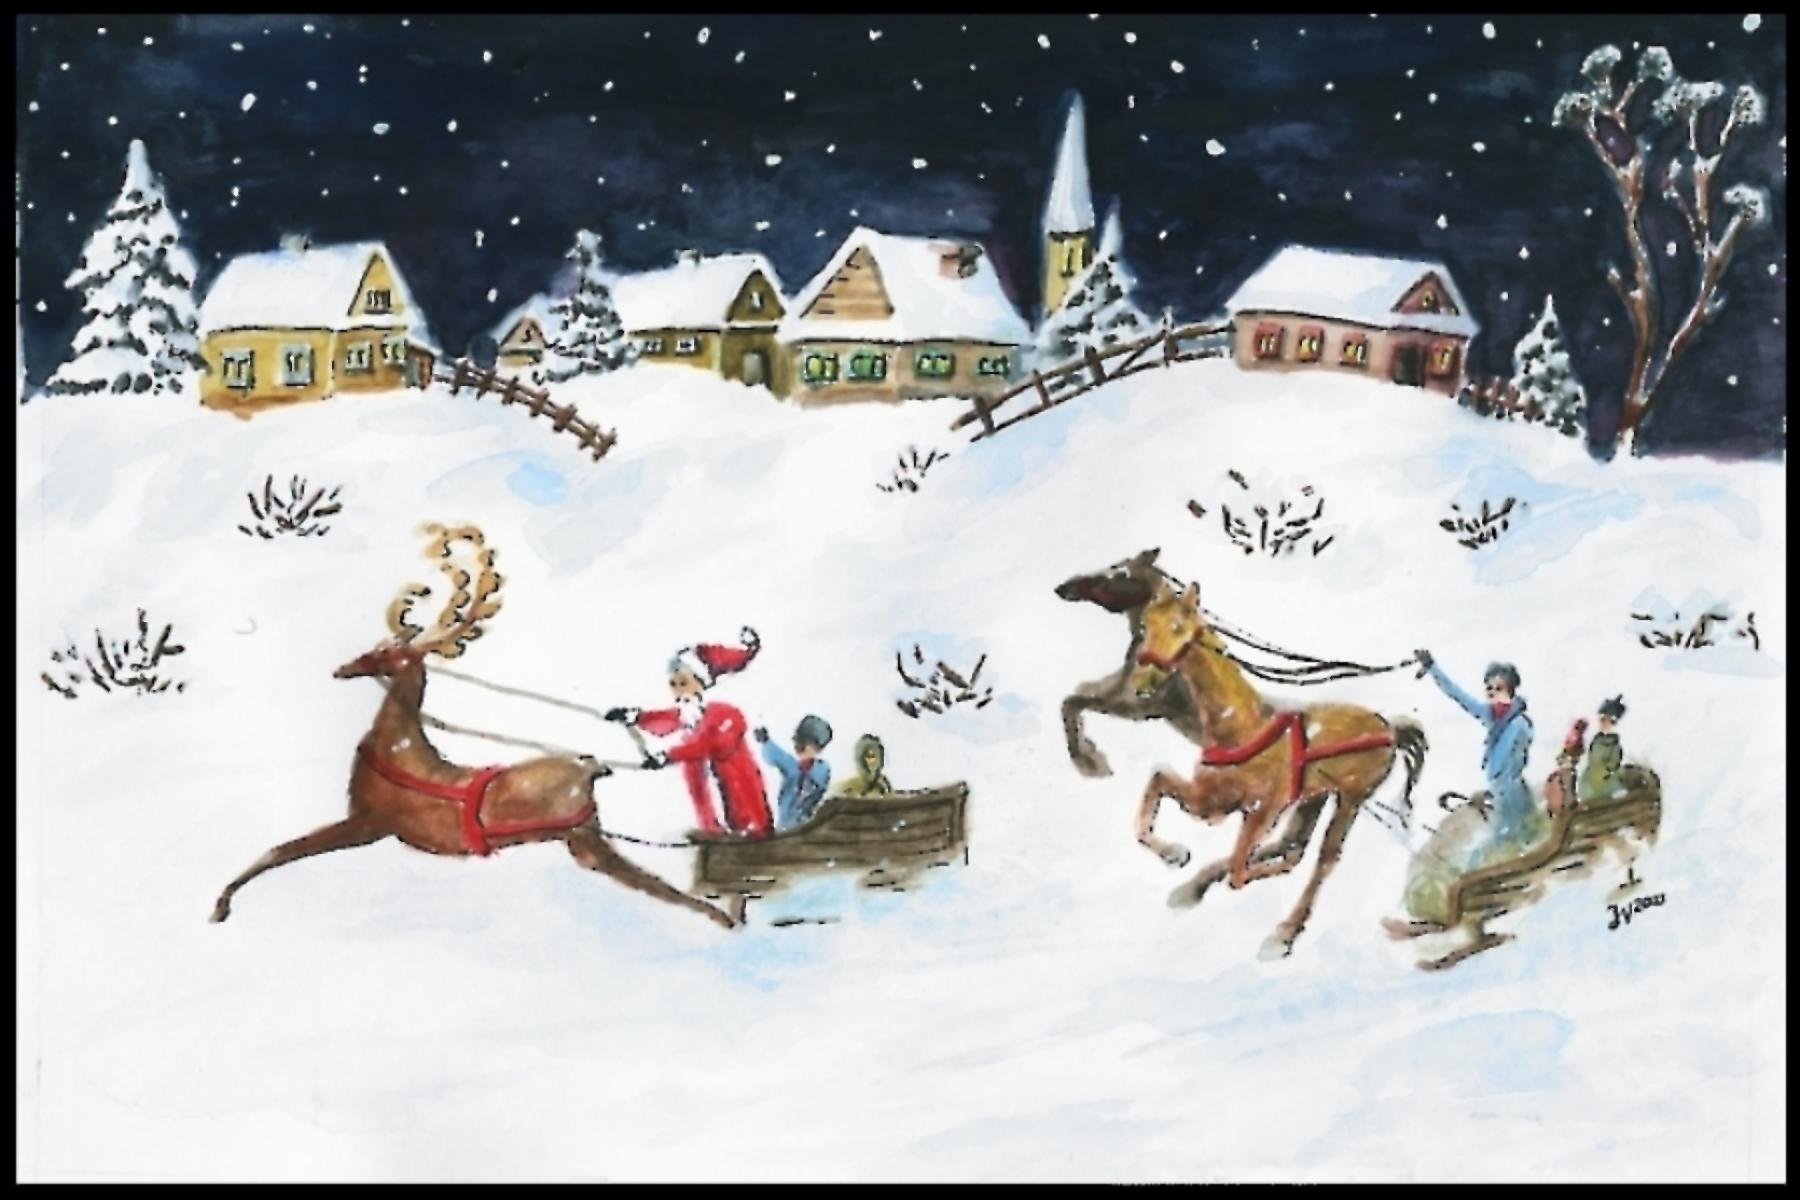 Santa Image - Old Fashioned